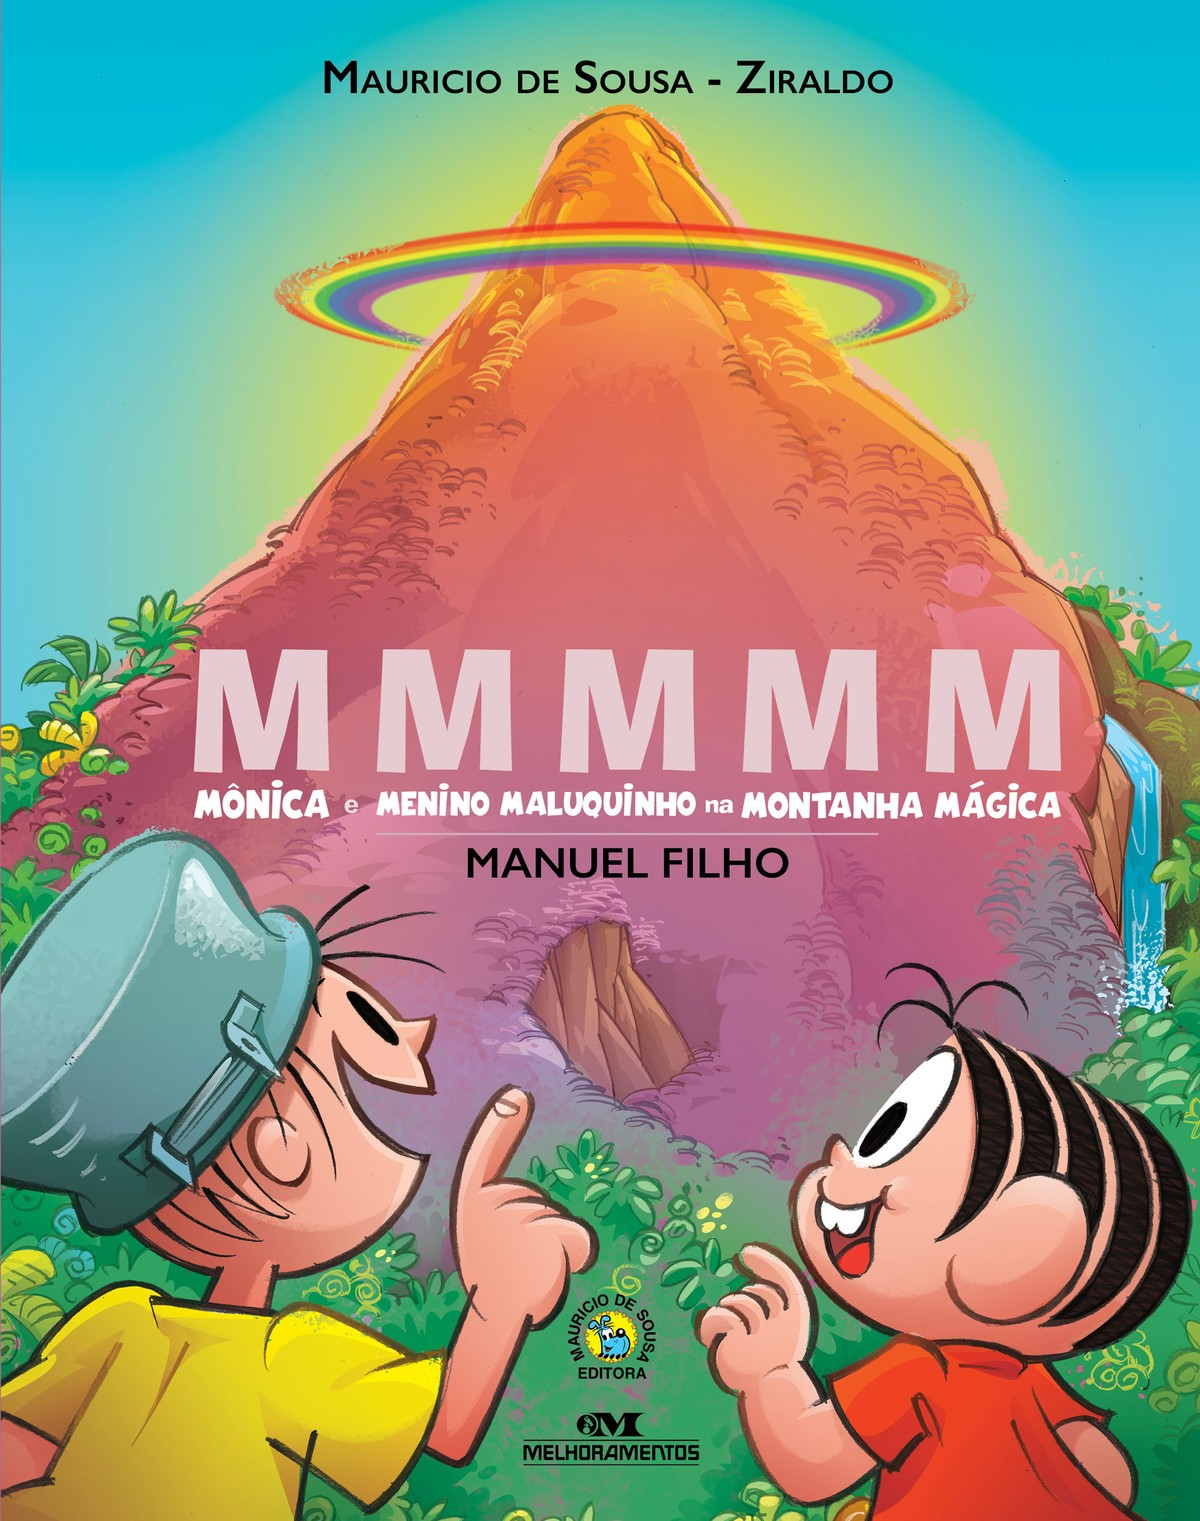 mmmmm-monica-e-menino-maluquinho-na-montanha-magica